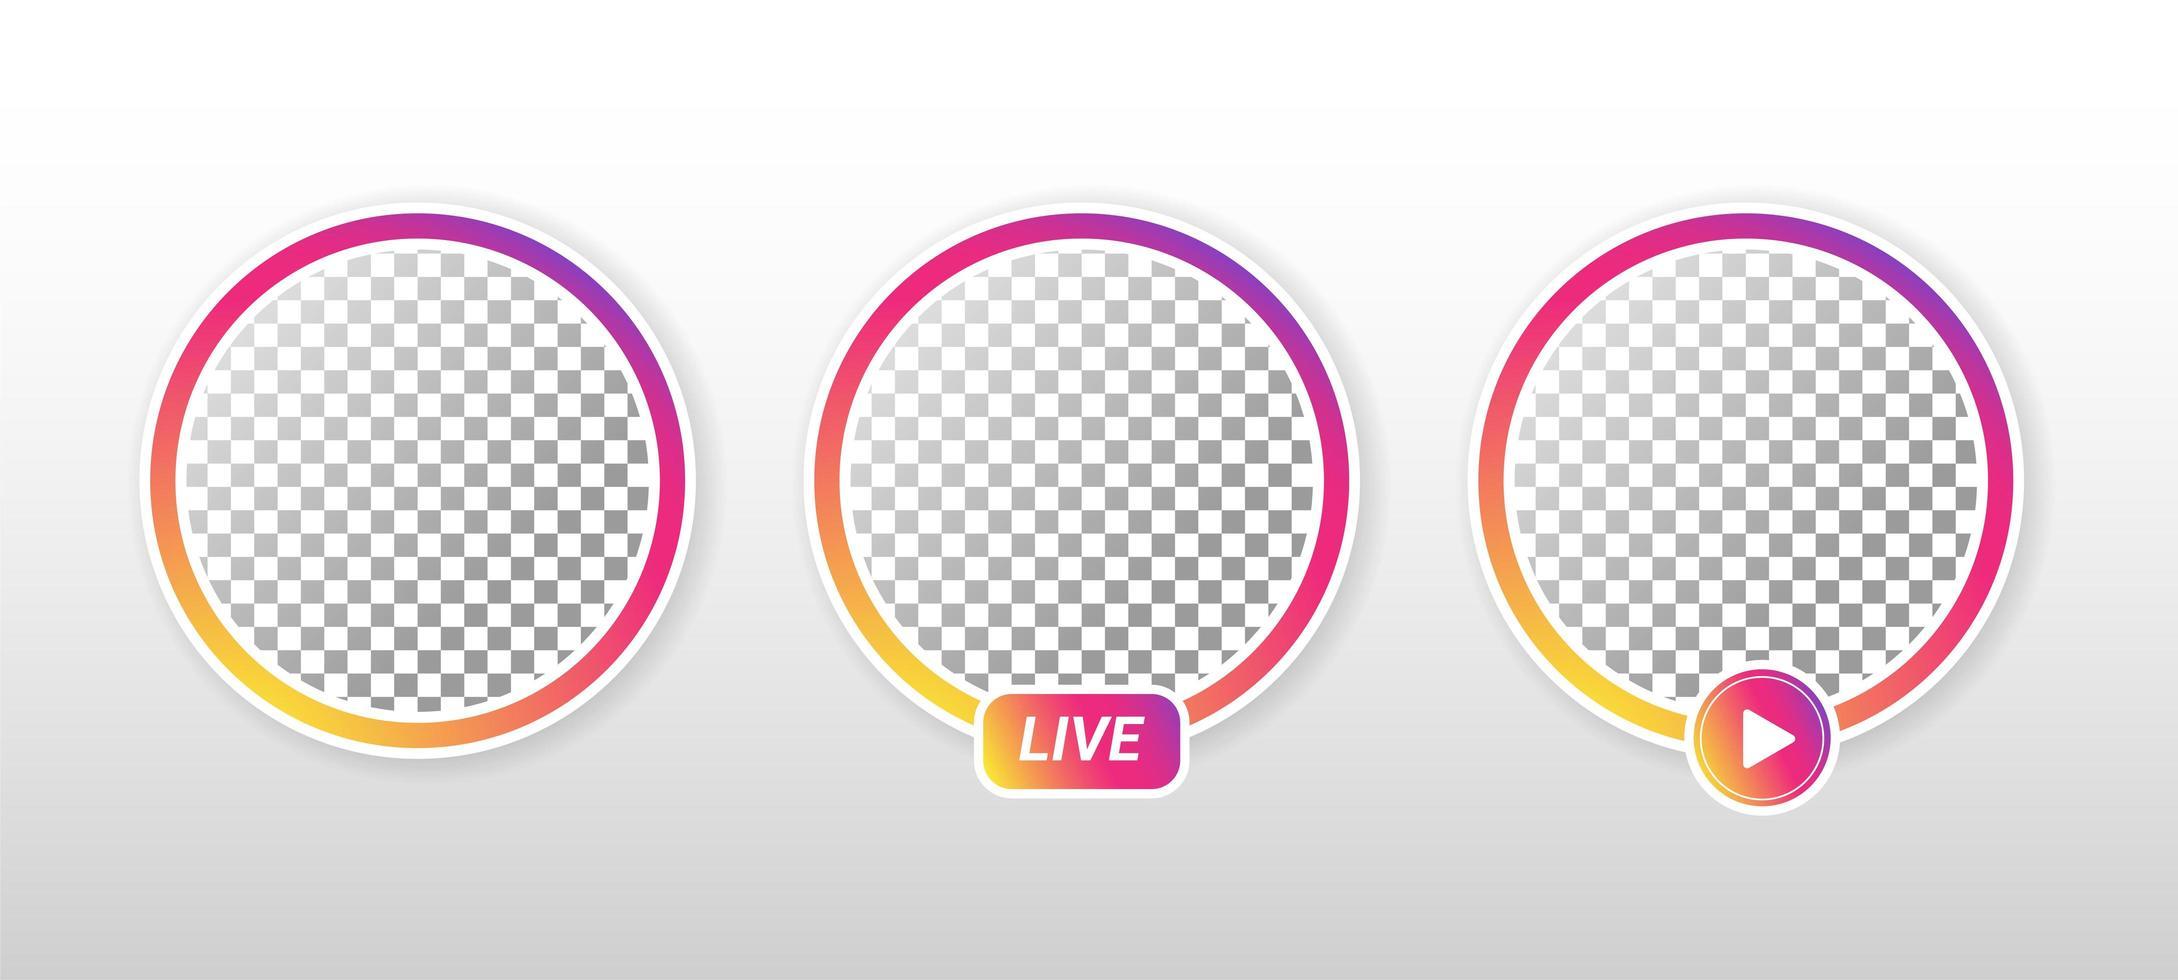 verloopcirkel live streaming op sociale media. vector